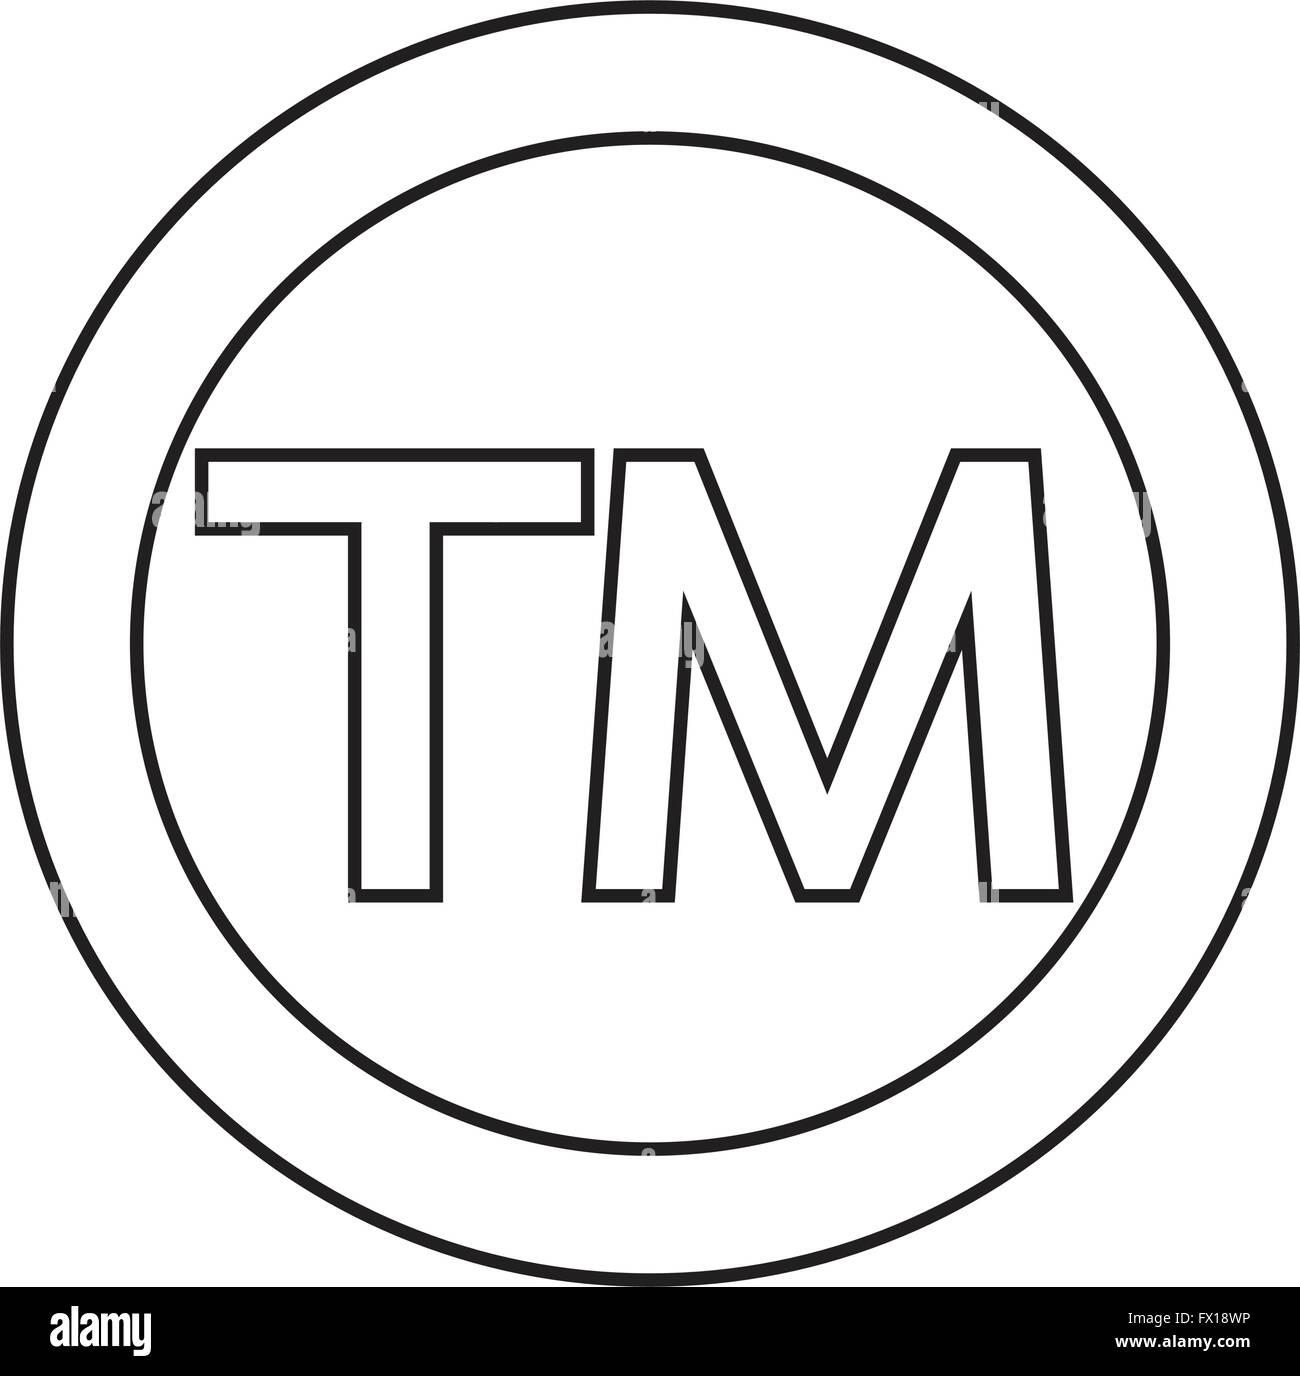 Trademark symbol icon stock vector art illustration vector trademark symbol icon buycottarizona